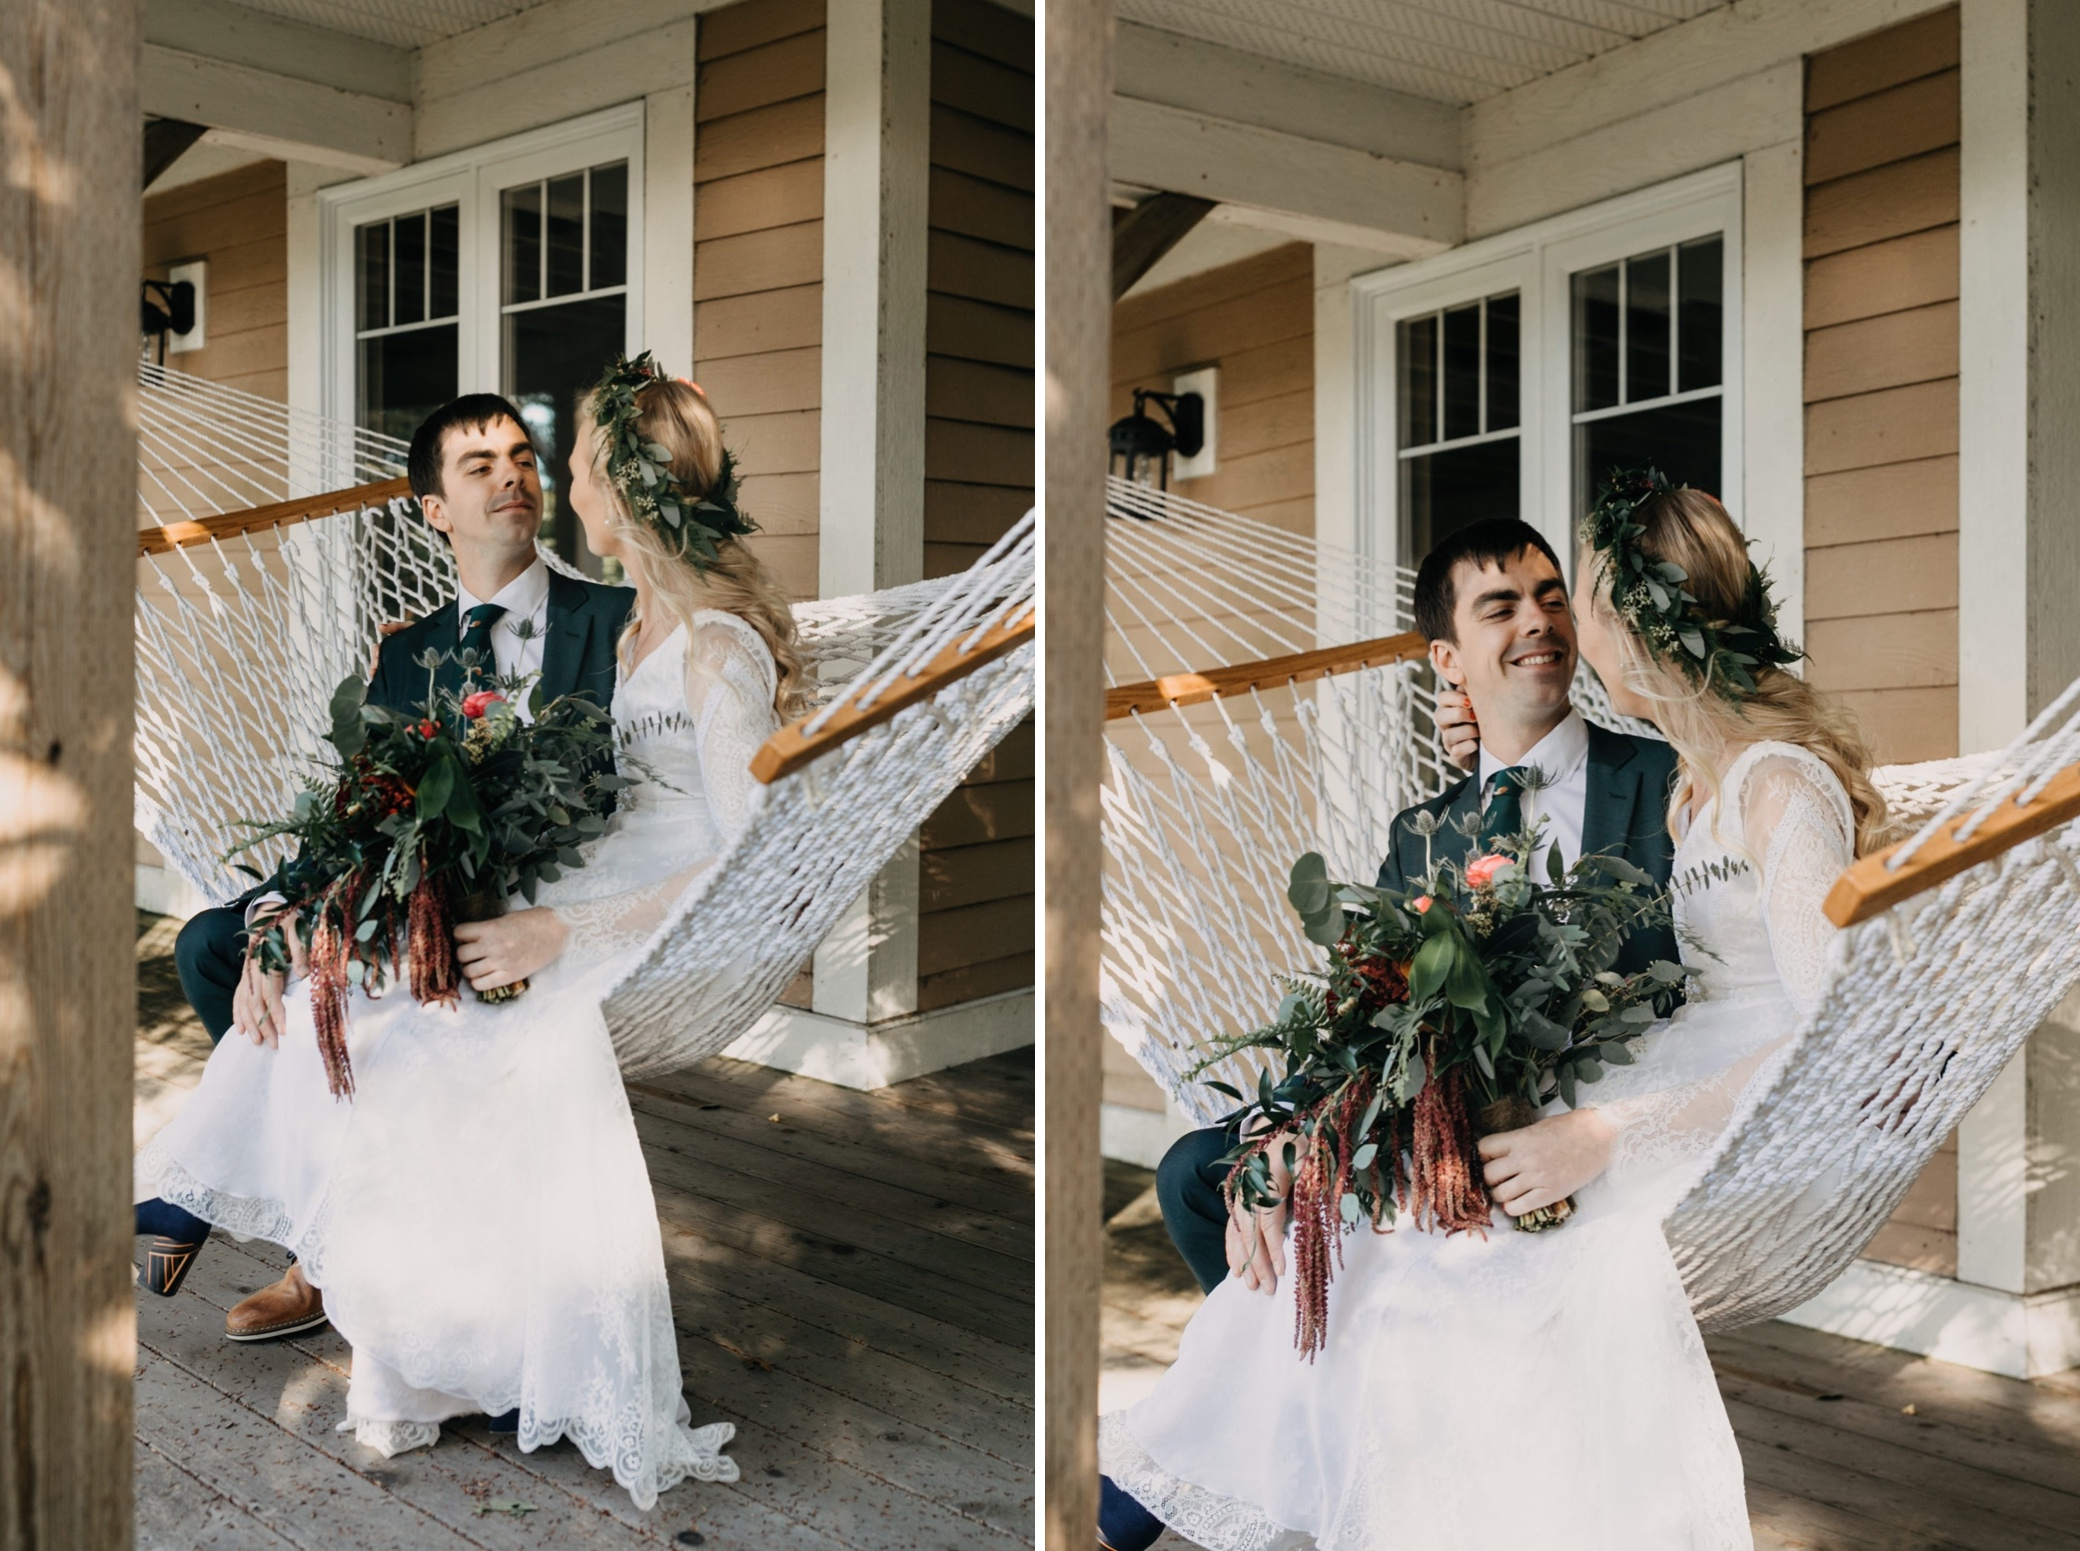 121_Huntsville Wedding  (321 of 689)_Huntsville Wedding  (320 of 689).jpg